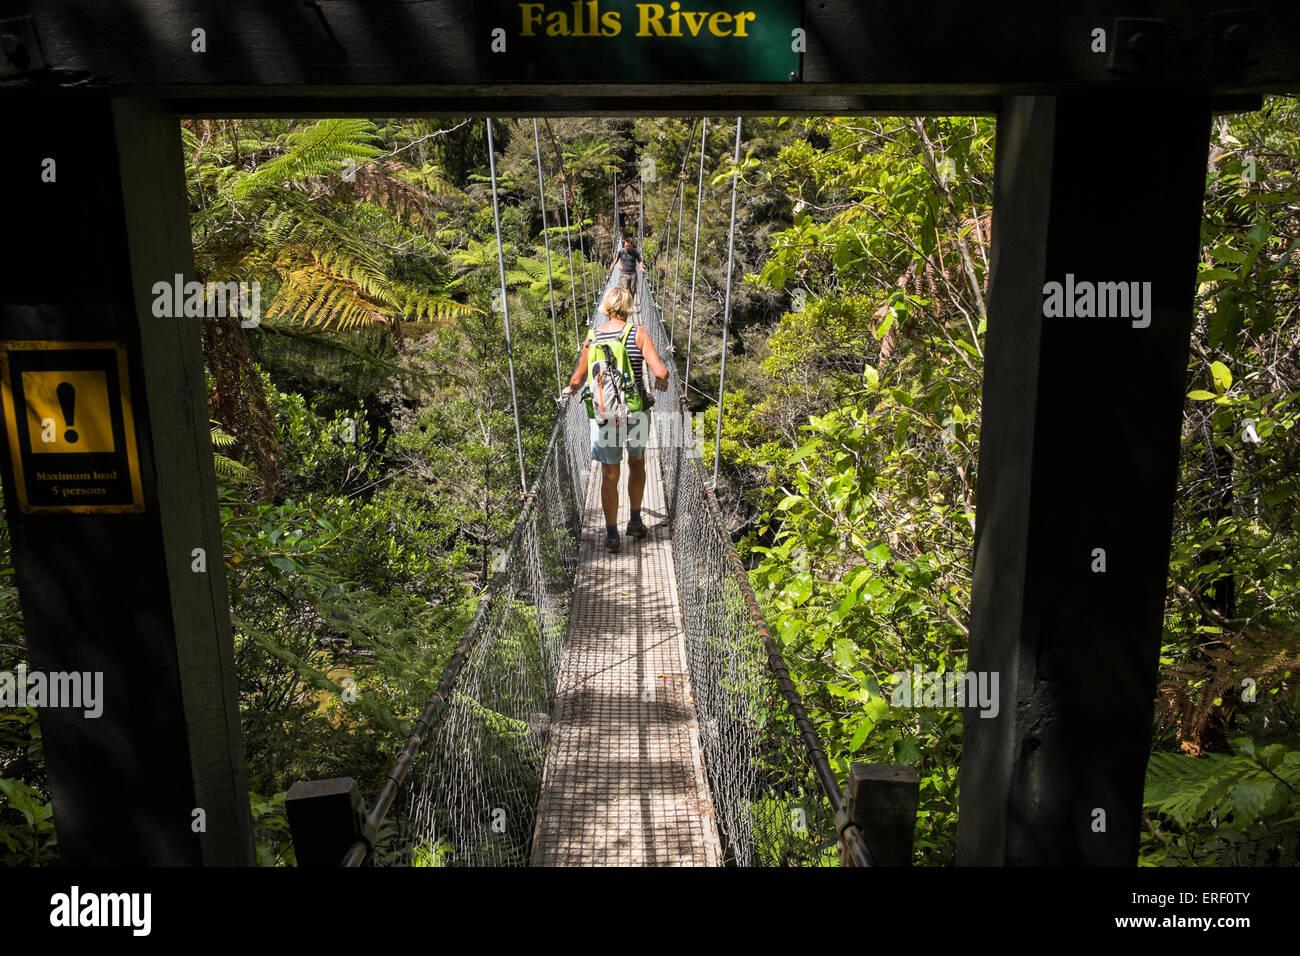 Walkers on the swingbridge over the Falls River along the Abel Tasman coastal track in New Zealand. - Stock Image